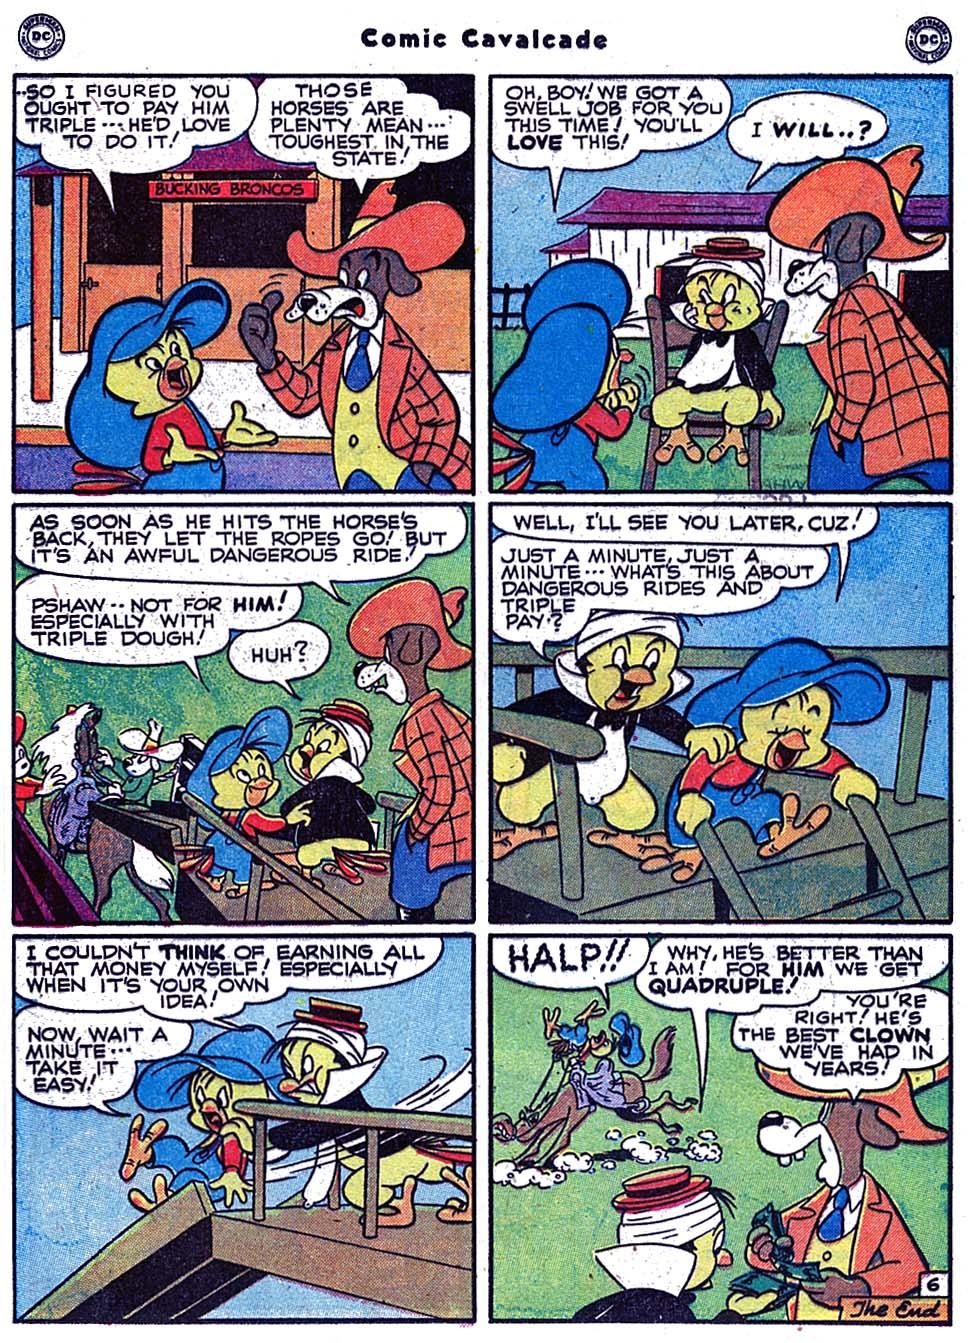 Comic Cavalcade issue 38 - Page 31